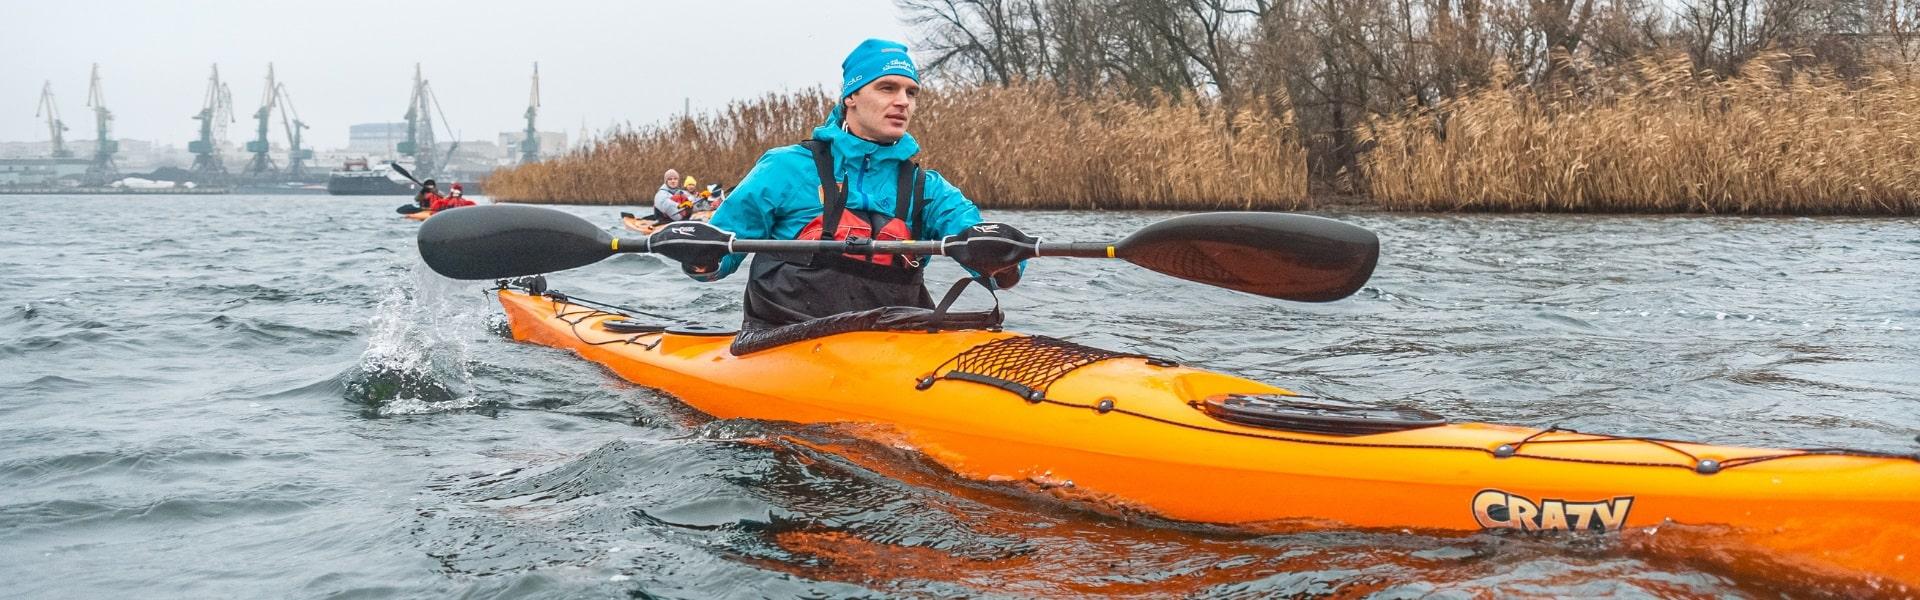 Winter Kayaking in the Floodplains